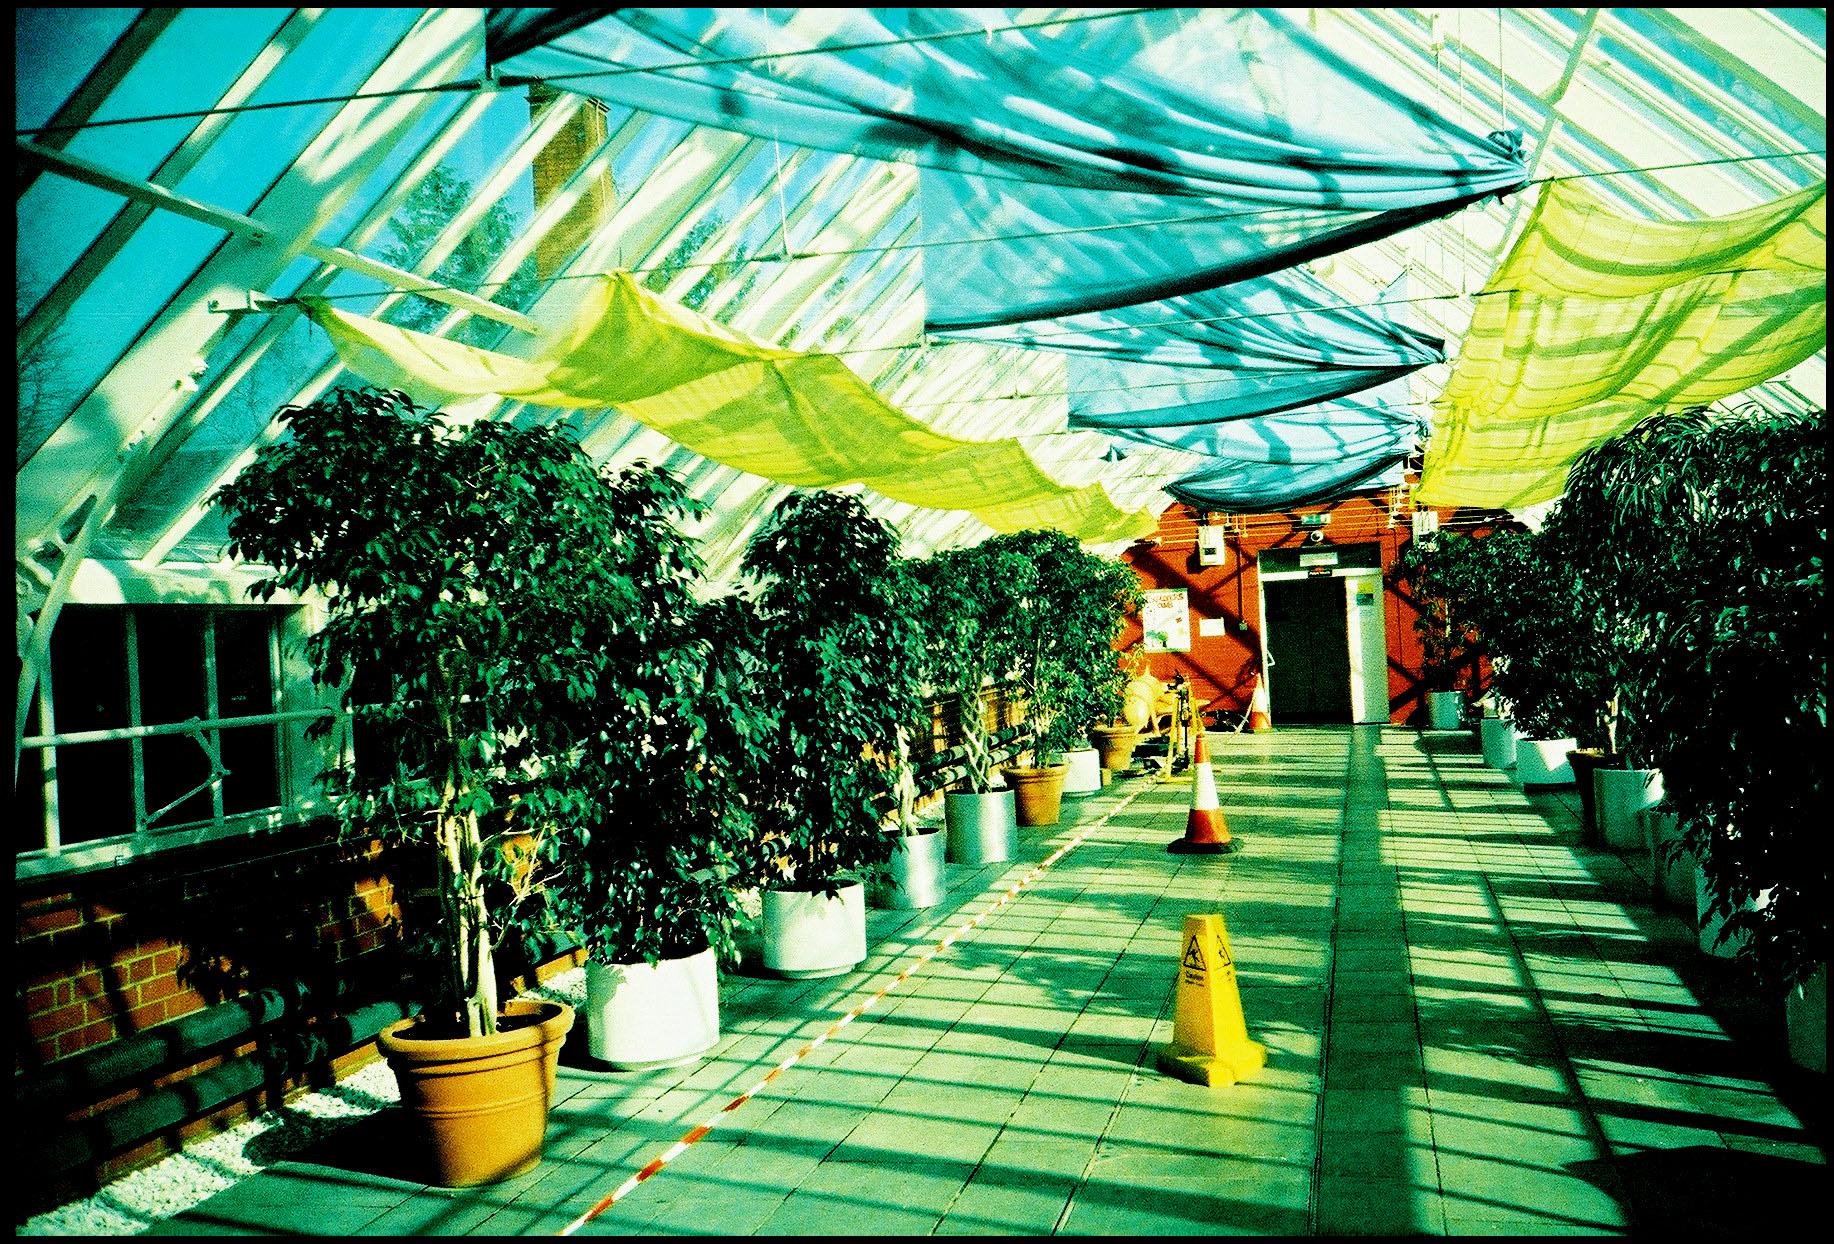 Glasgow Botanical Gardens Glasshouse Queen's Park